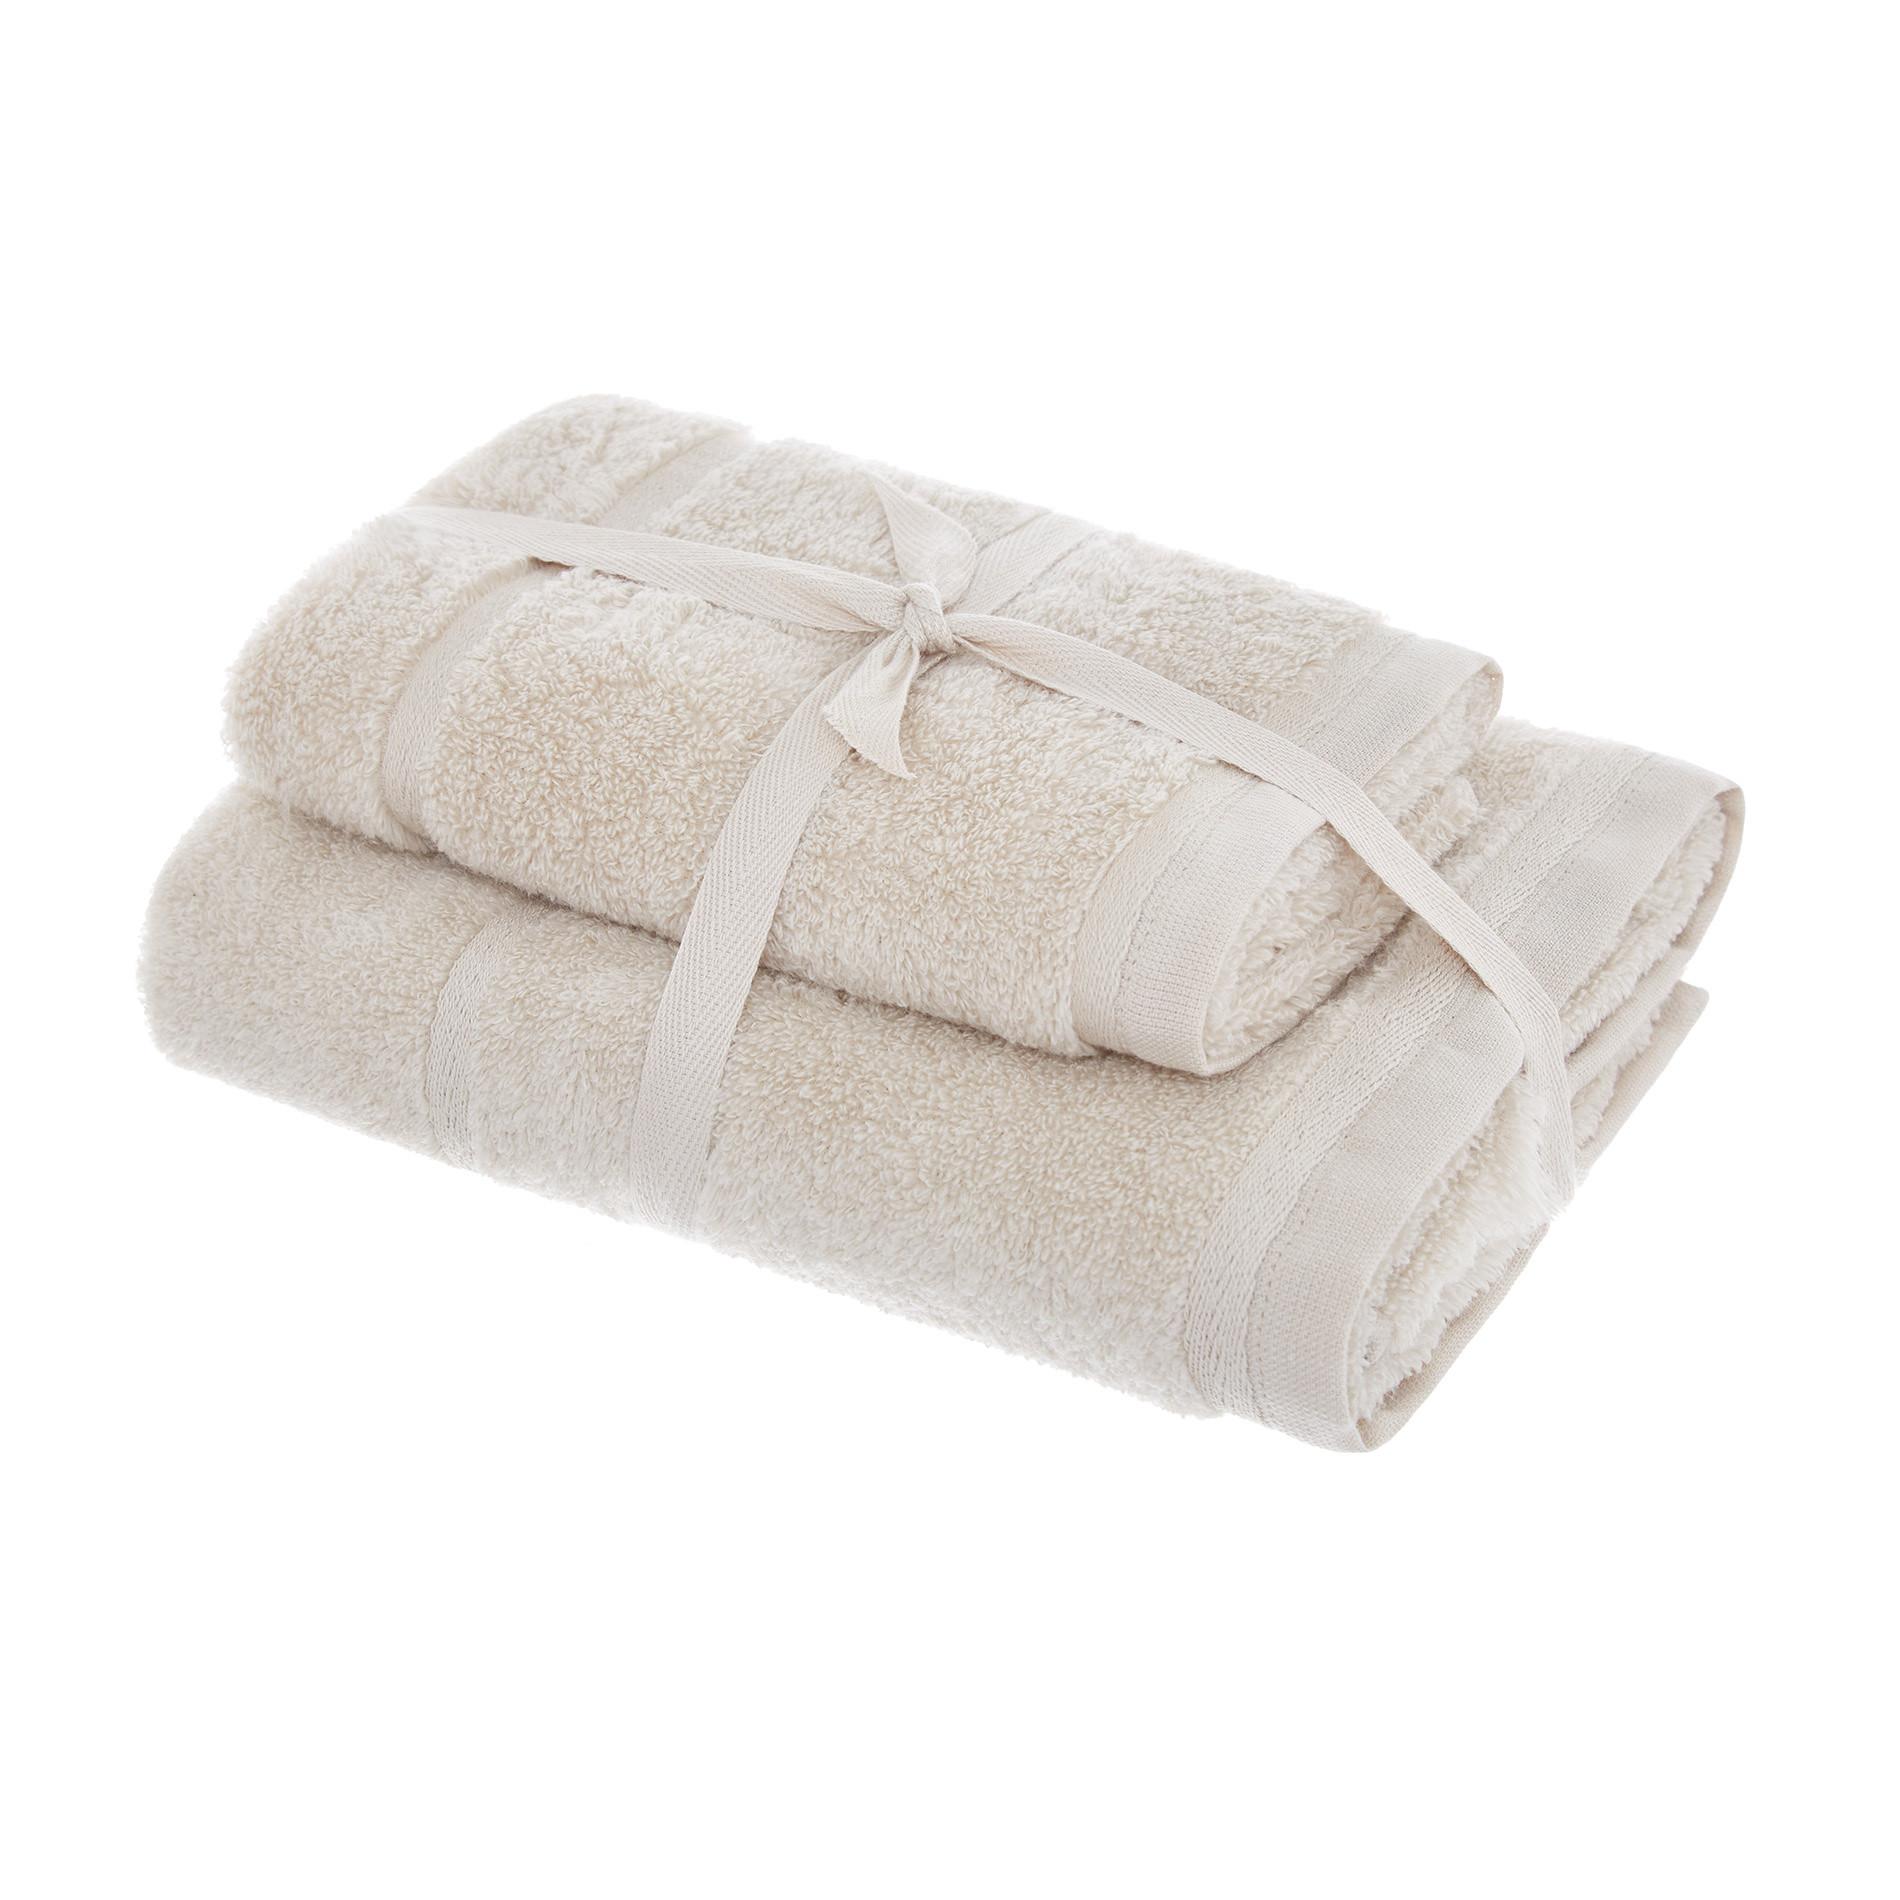 Set asciugamani spugna di cotone tinta unita, Beige, large image number 0